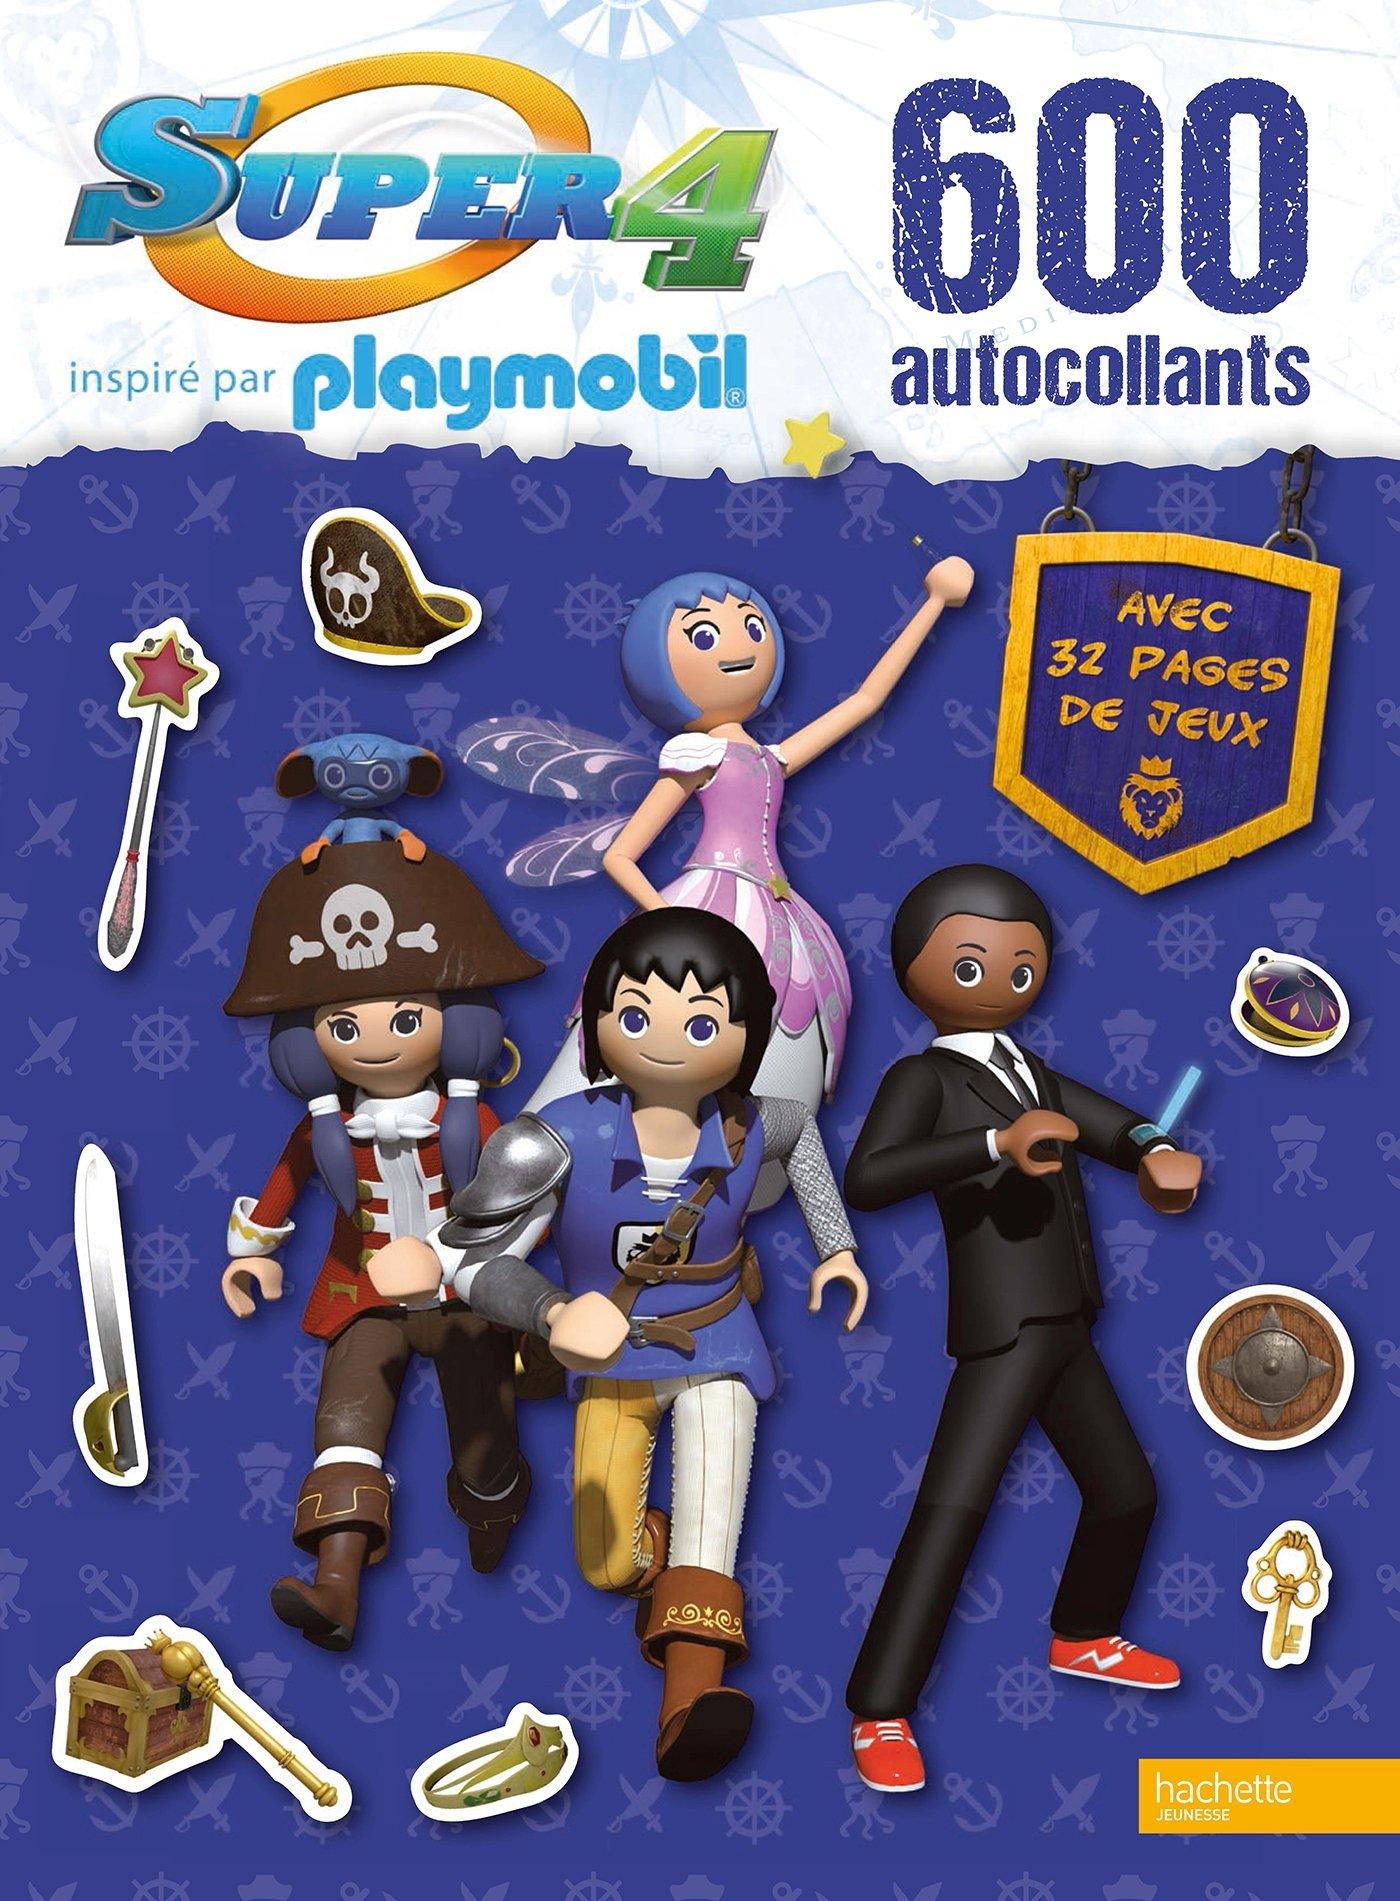 Super 4 Playmobil : 600 autocollants